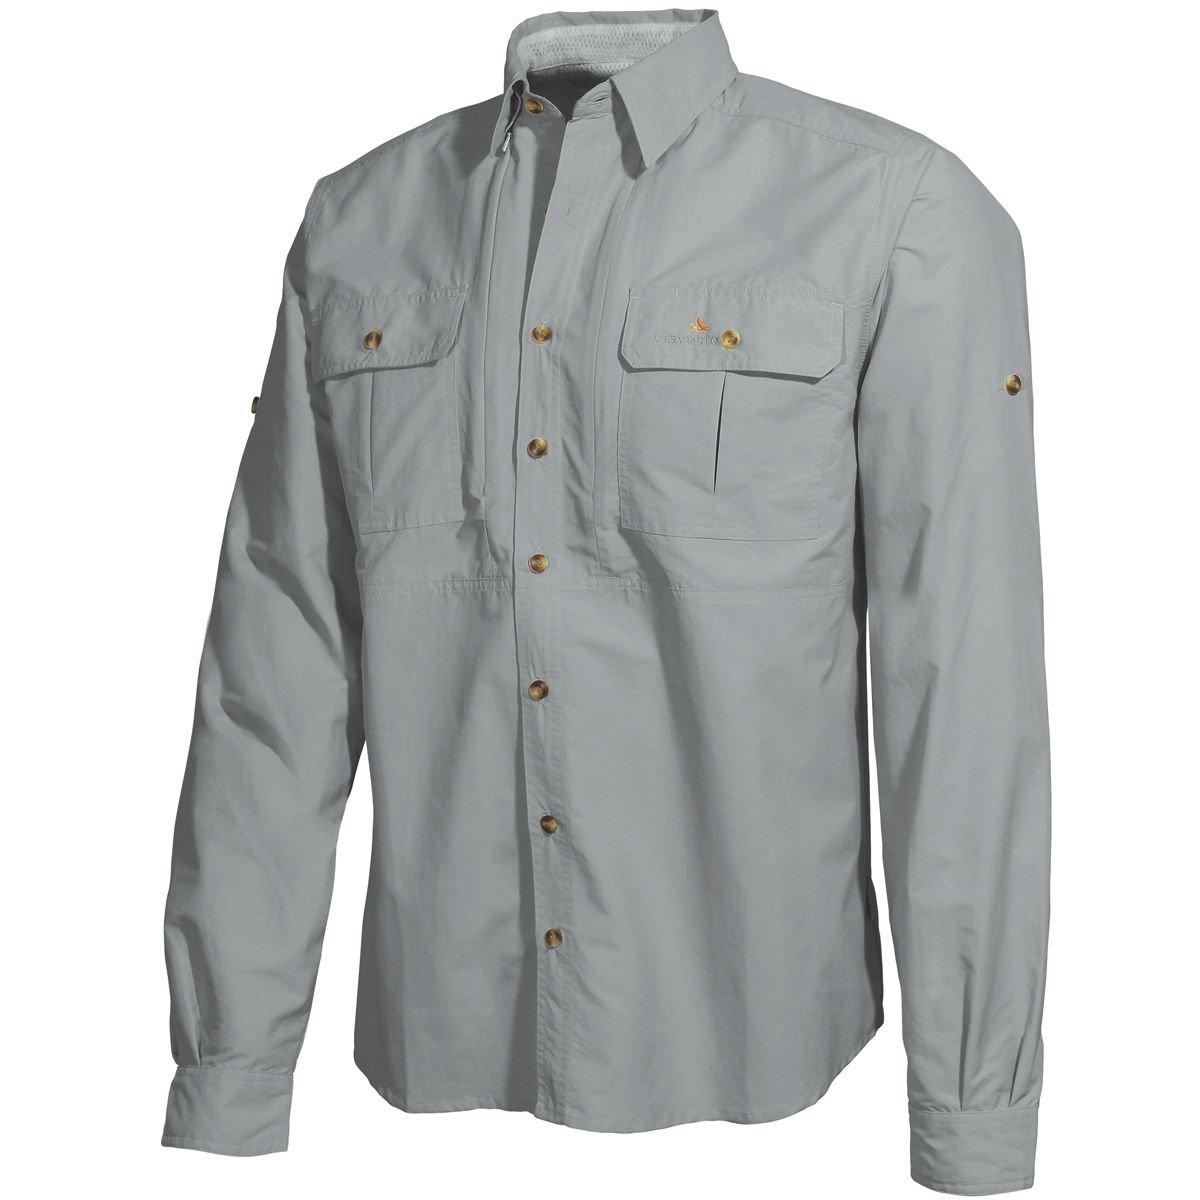 ViaVesto Senhor Eanes Shirt Shirt Shirt Men - Outdoorhemd B01K9LMHNW Freizeit Attraktive Mode 021780